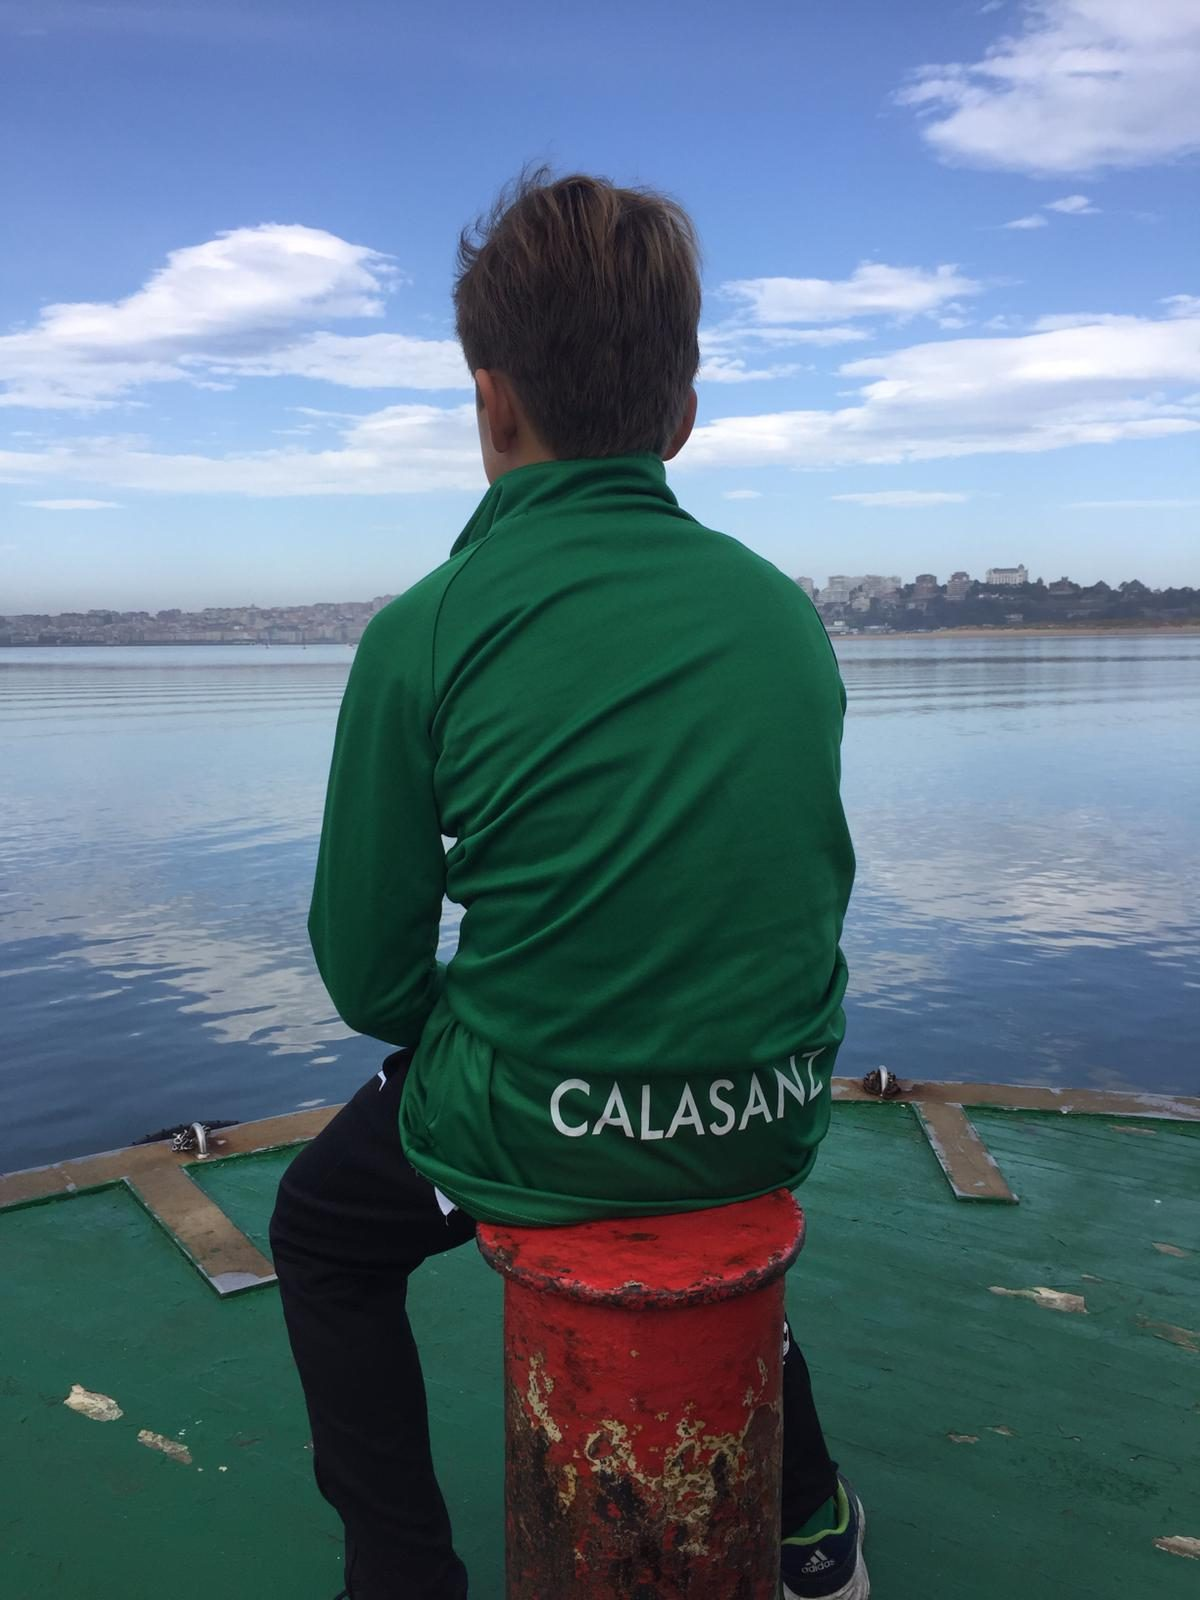 Club Deportivo Calasanz Santander